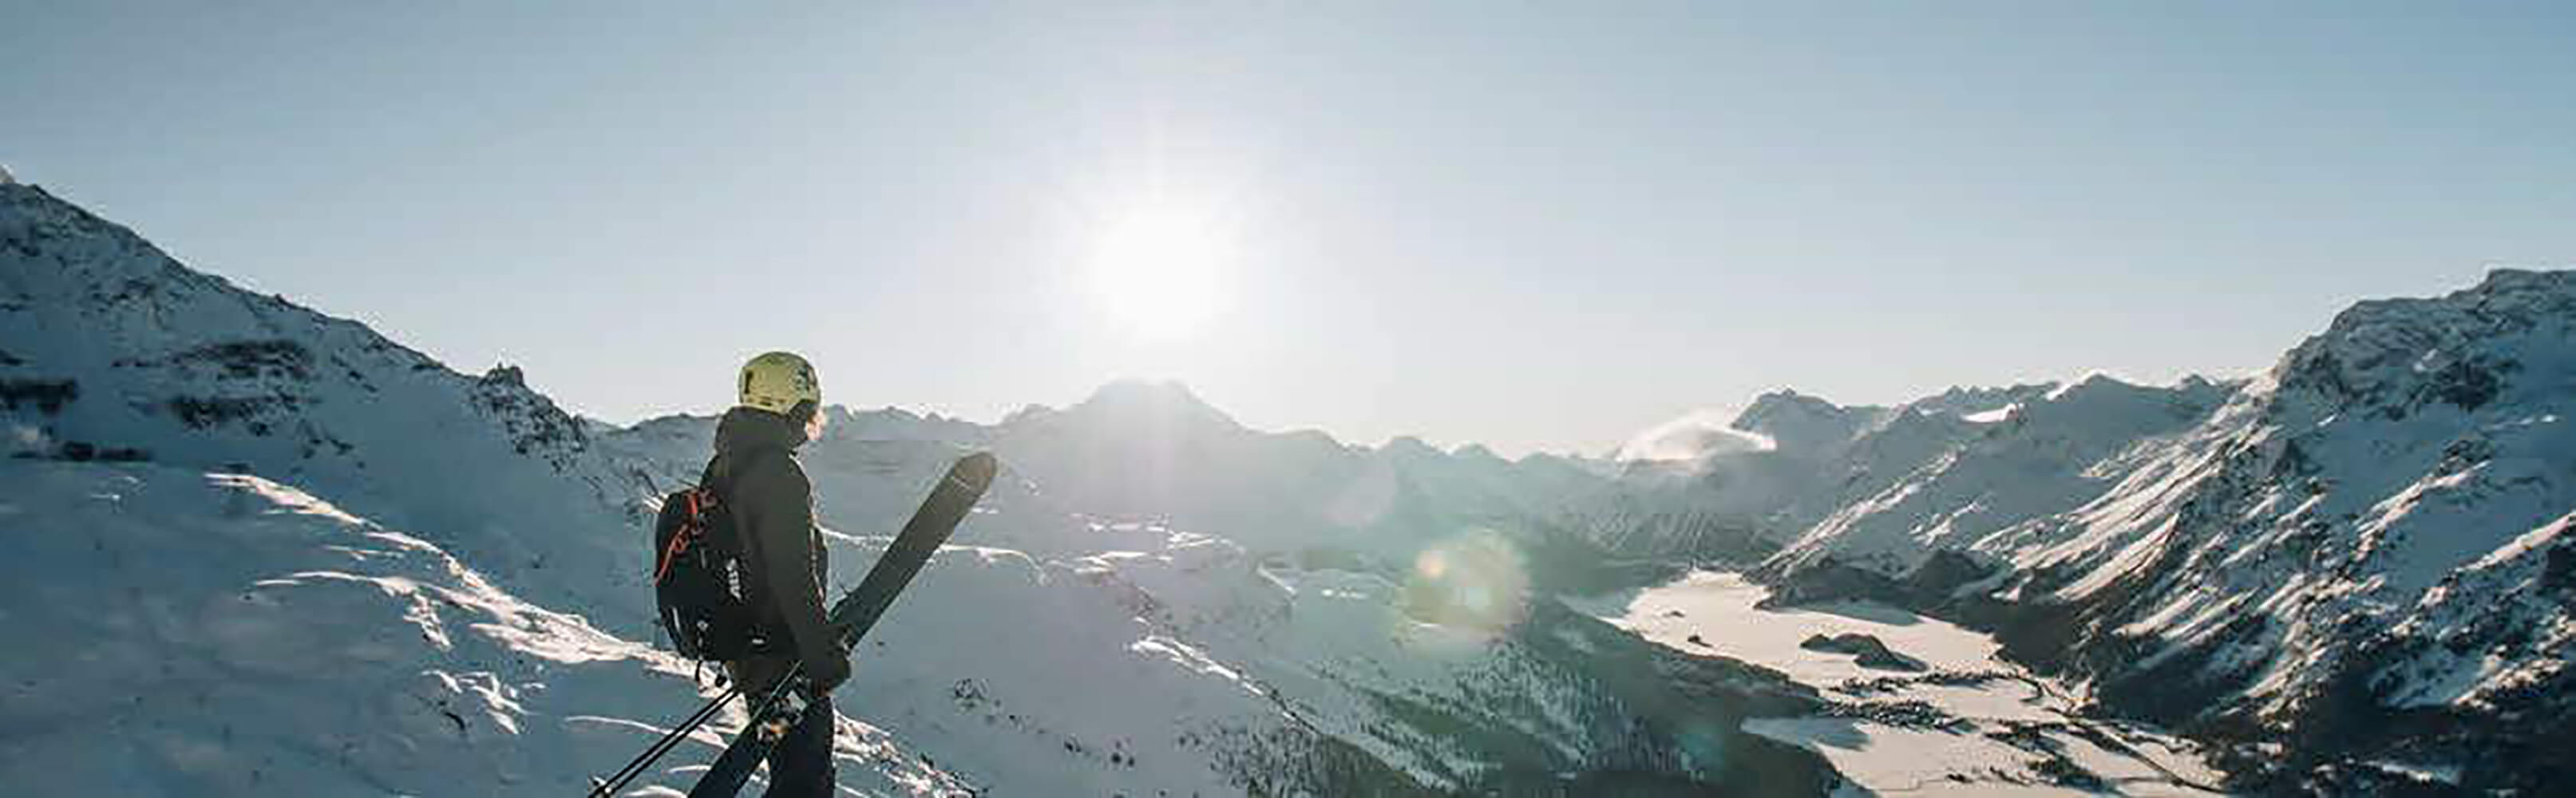 Engadin St. Moritz: Die Heimat des Winters 1